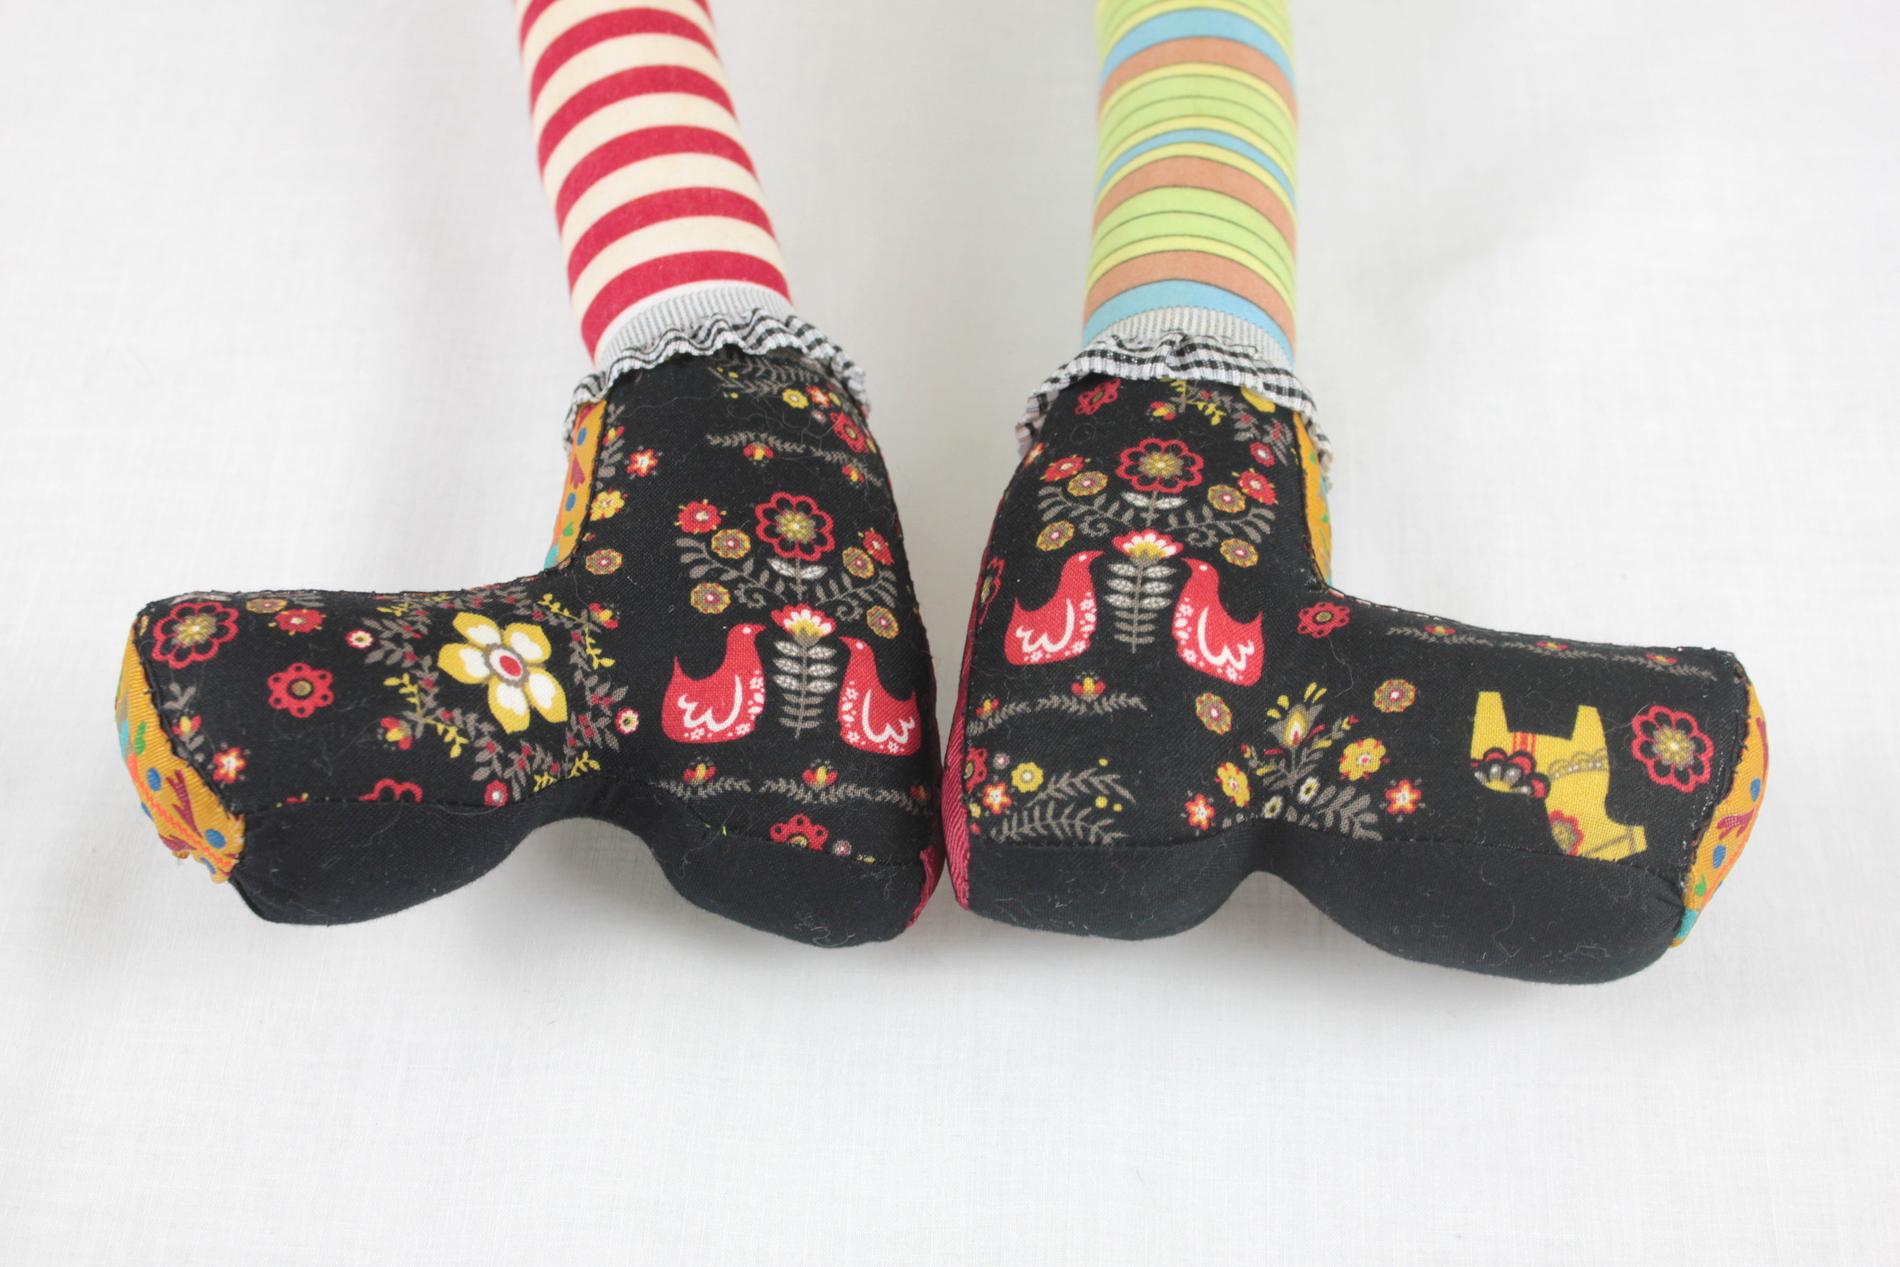 Pippi Longstocking (shoe detail)